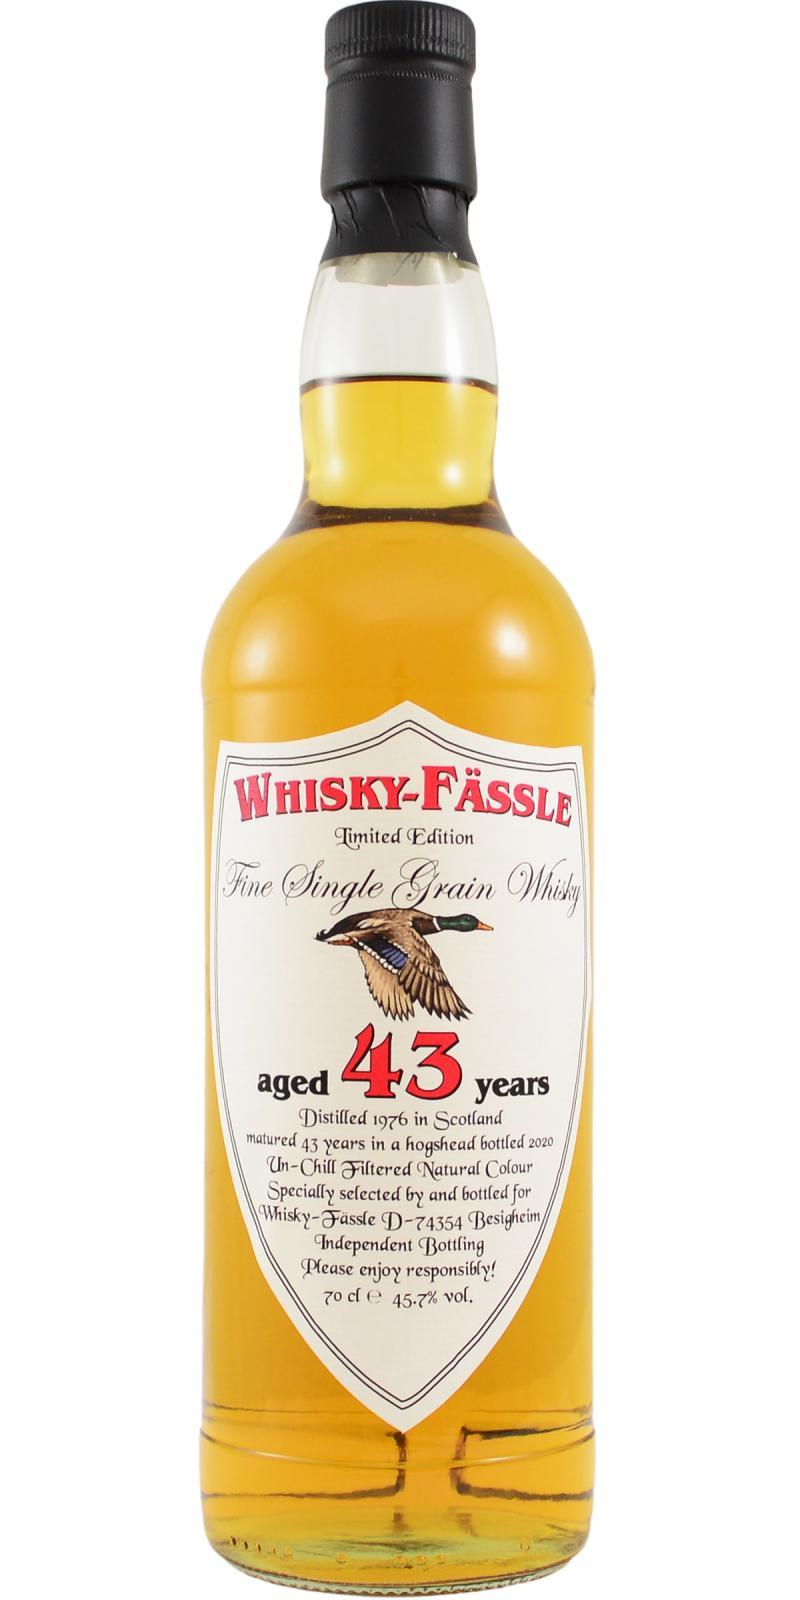 Fine Single Grain Whisky 1976 W-F